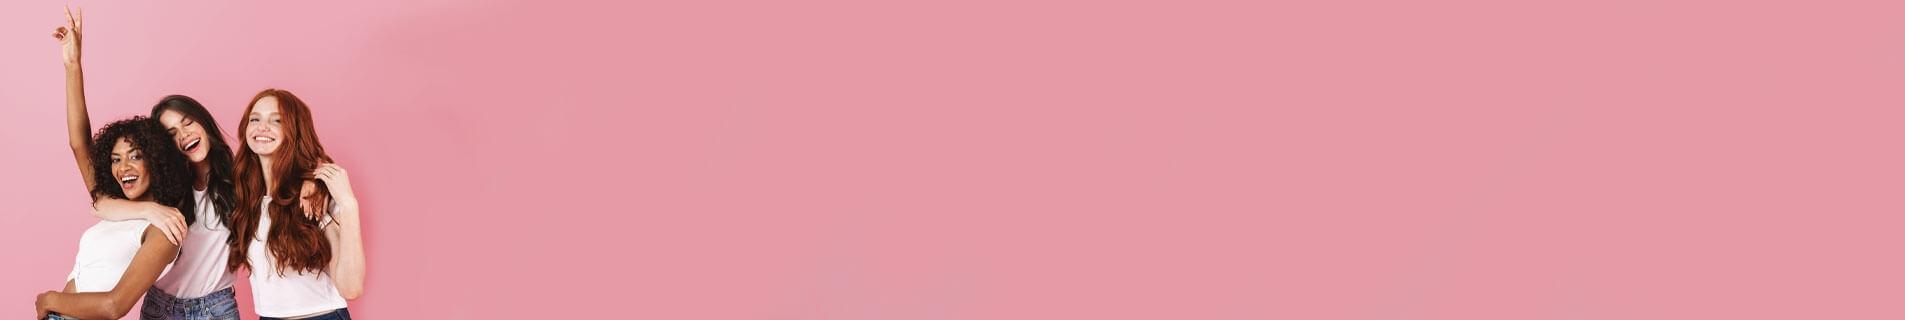 Ventes privées soins corps | Cosmetique pas cher | SAGA Cosmetics